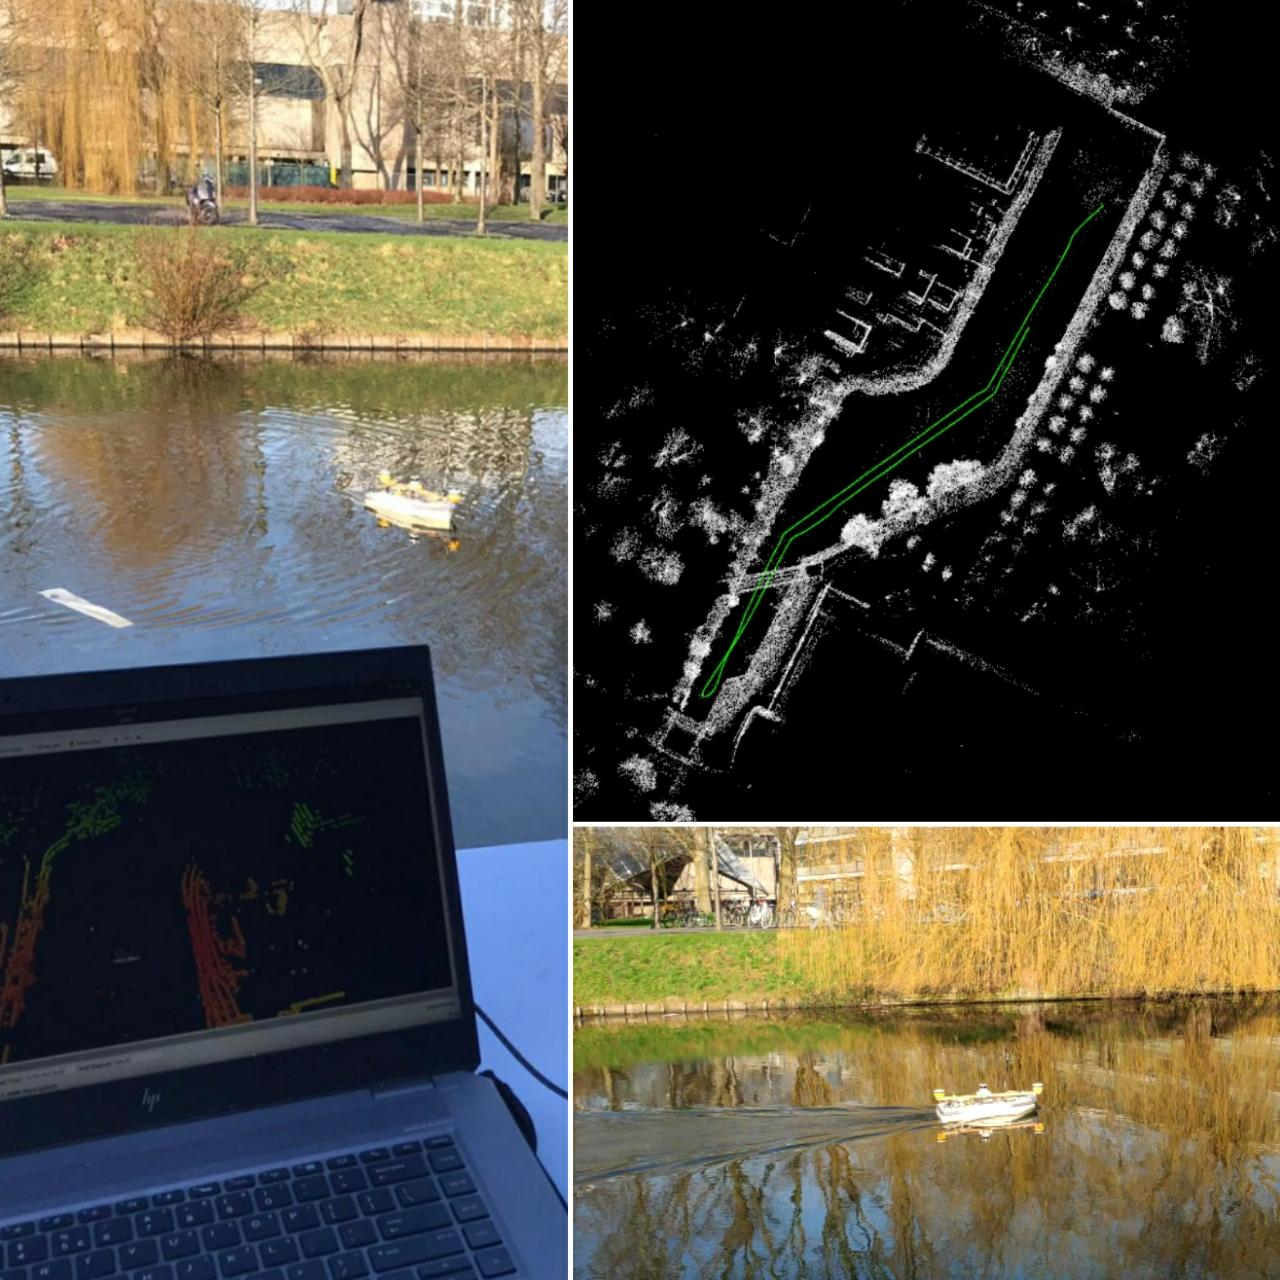 DEMCON Unmanned Systems experimenteert met varende drone